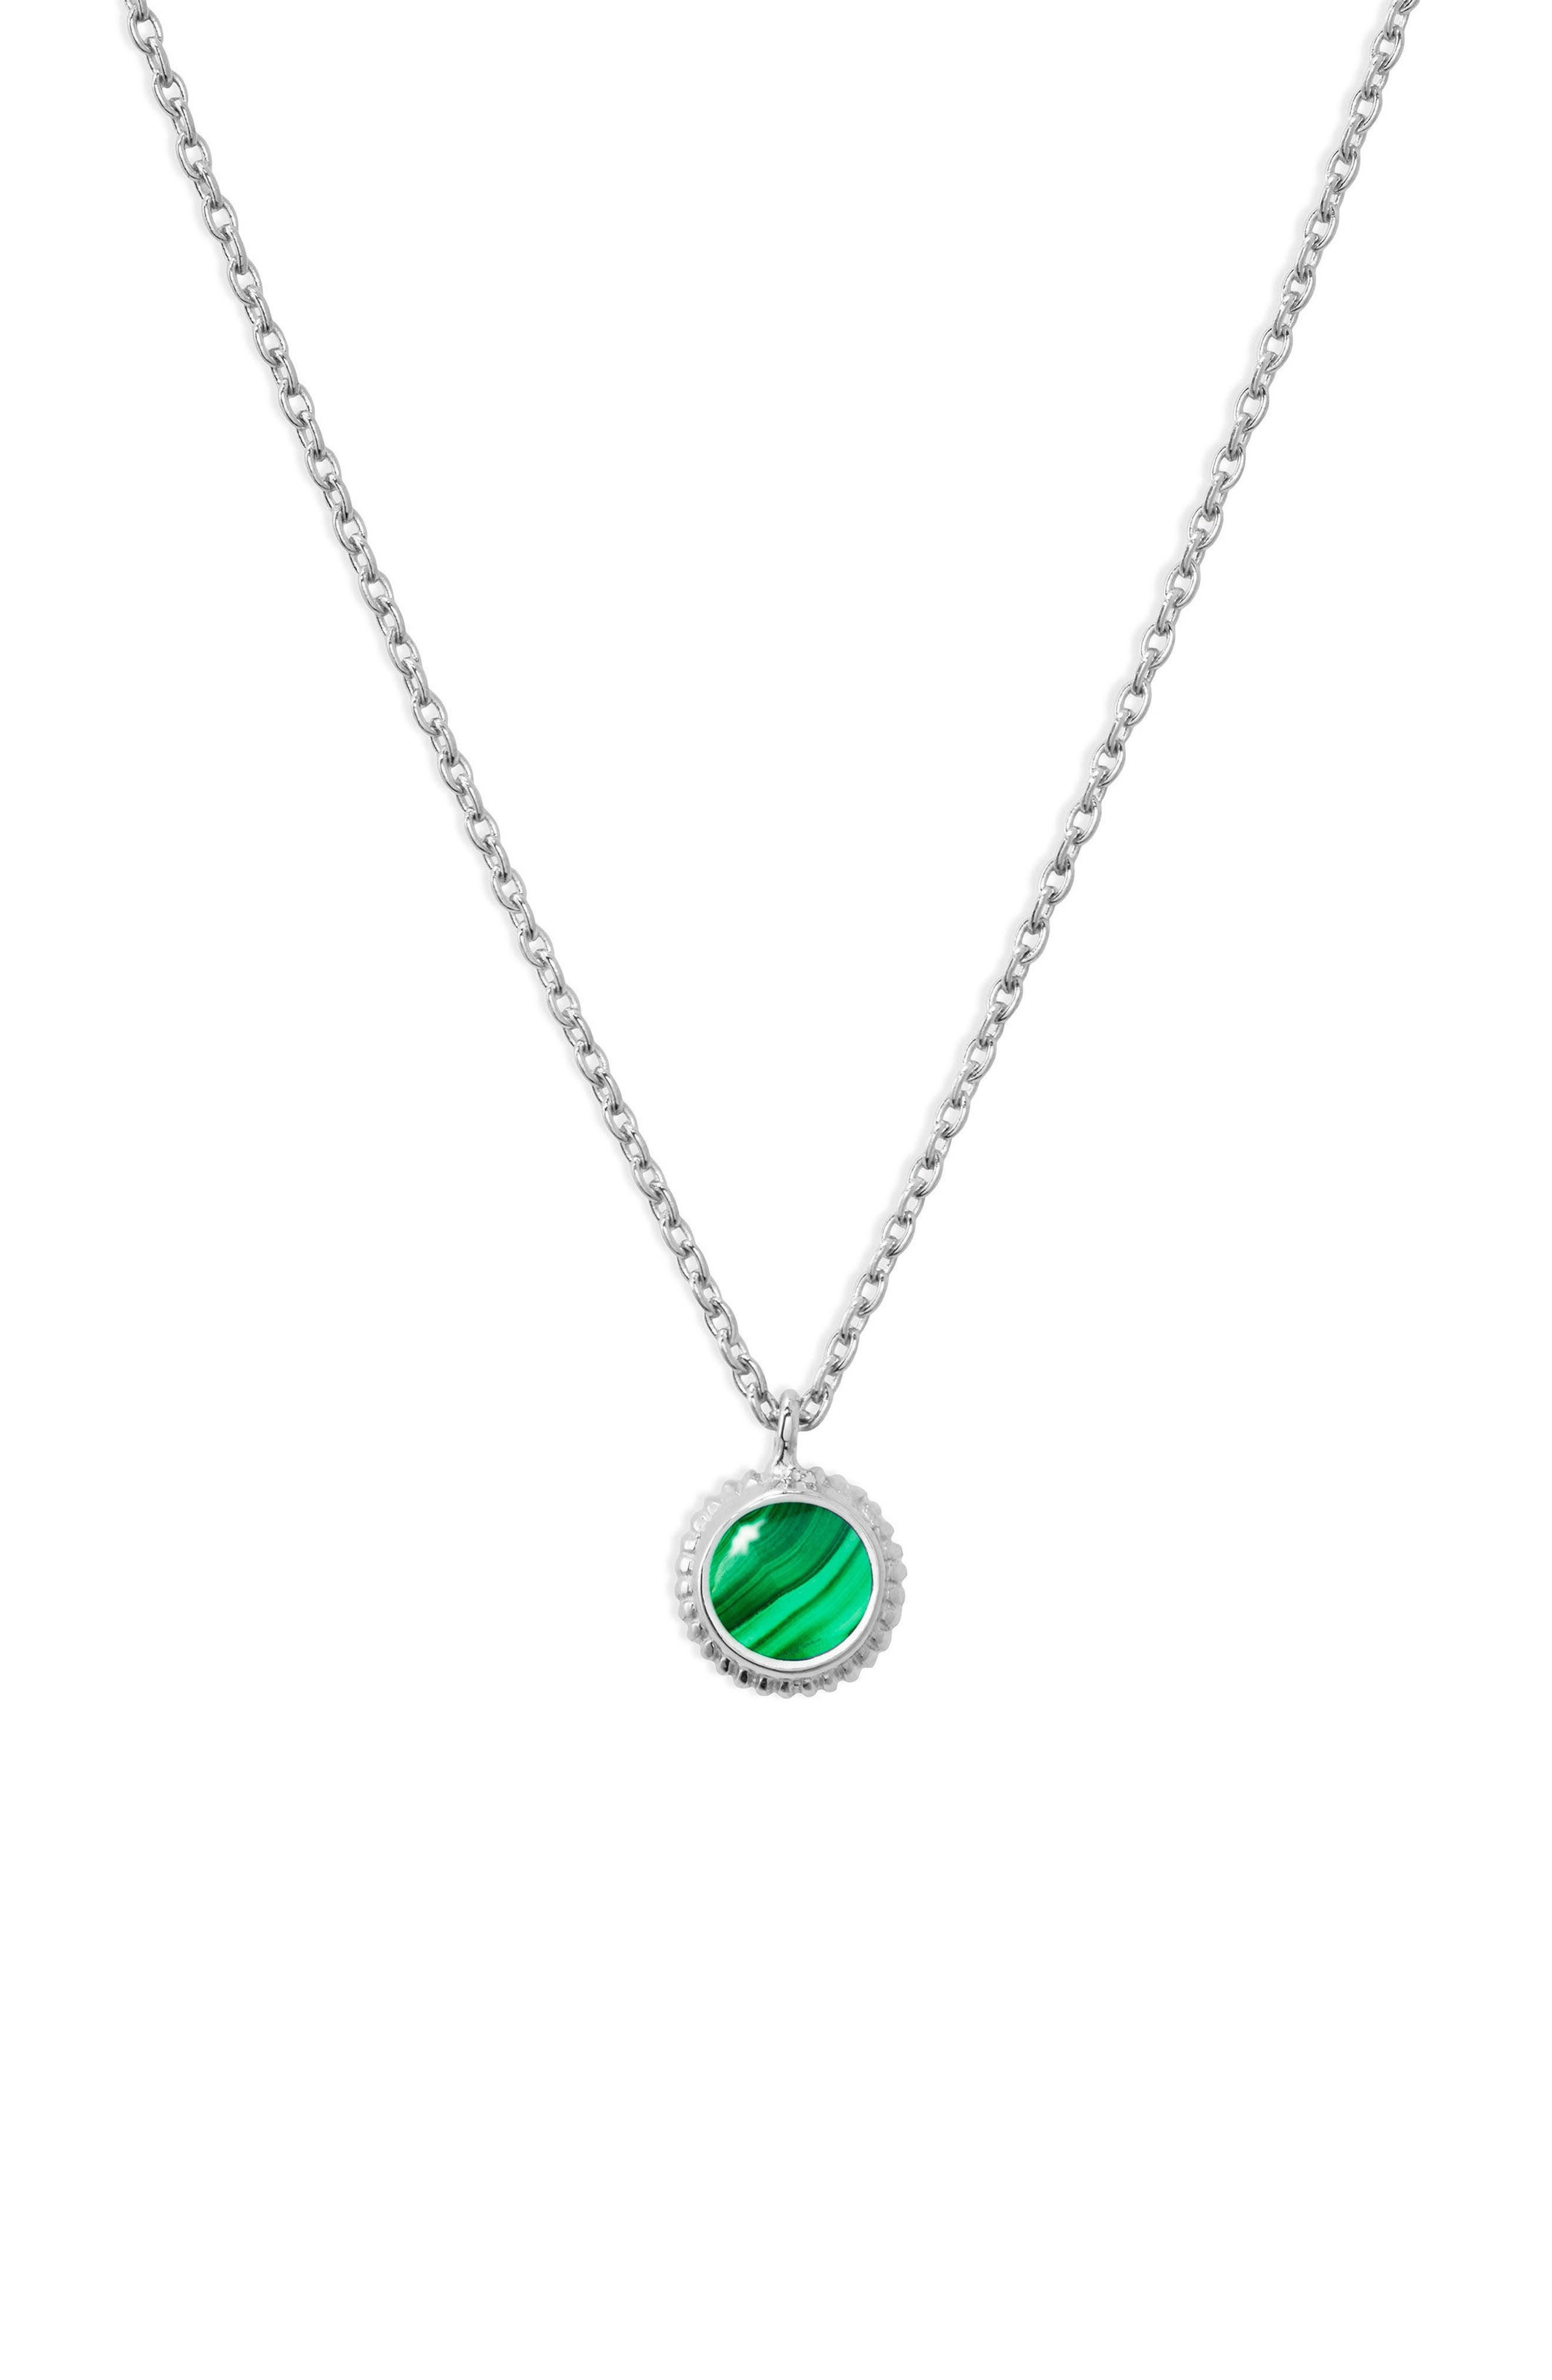 Alternate Image 1 Selected - Shinola Semiprecious Stone Pendant Necklace